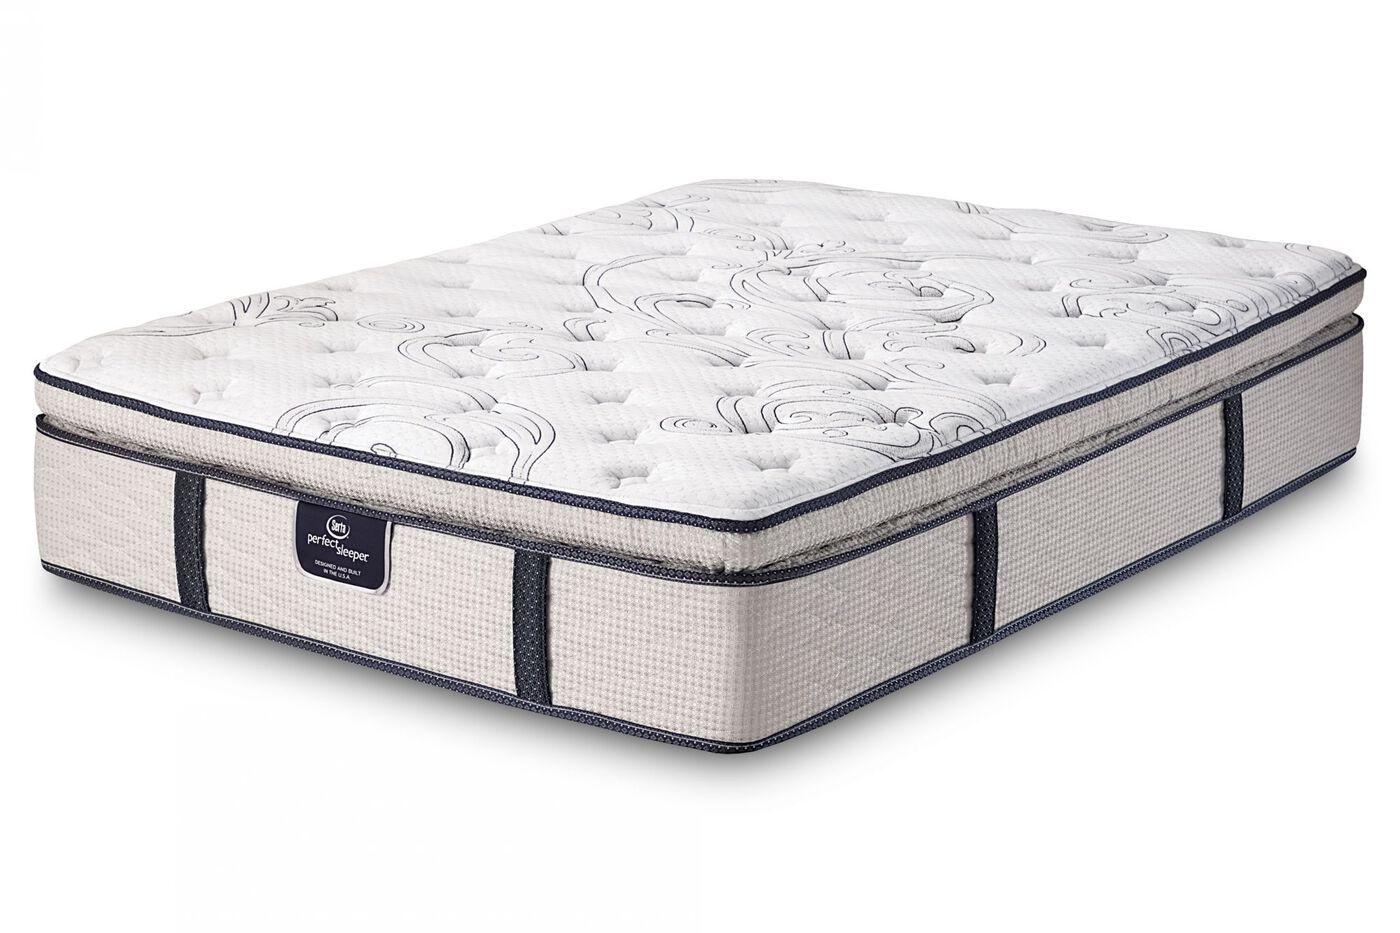 Serta perfect sleeper grand sky plush mattress mathis for Bed mattresses